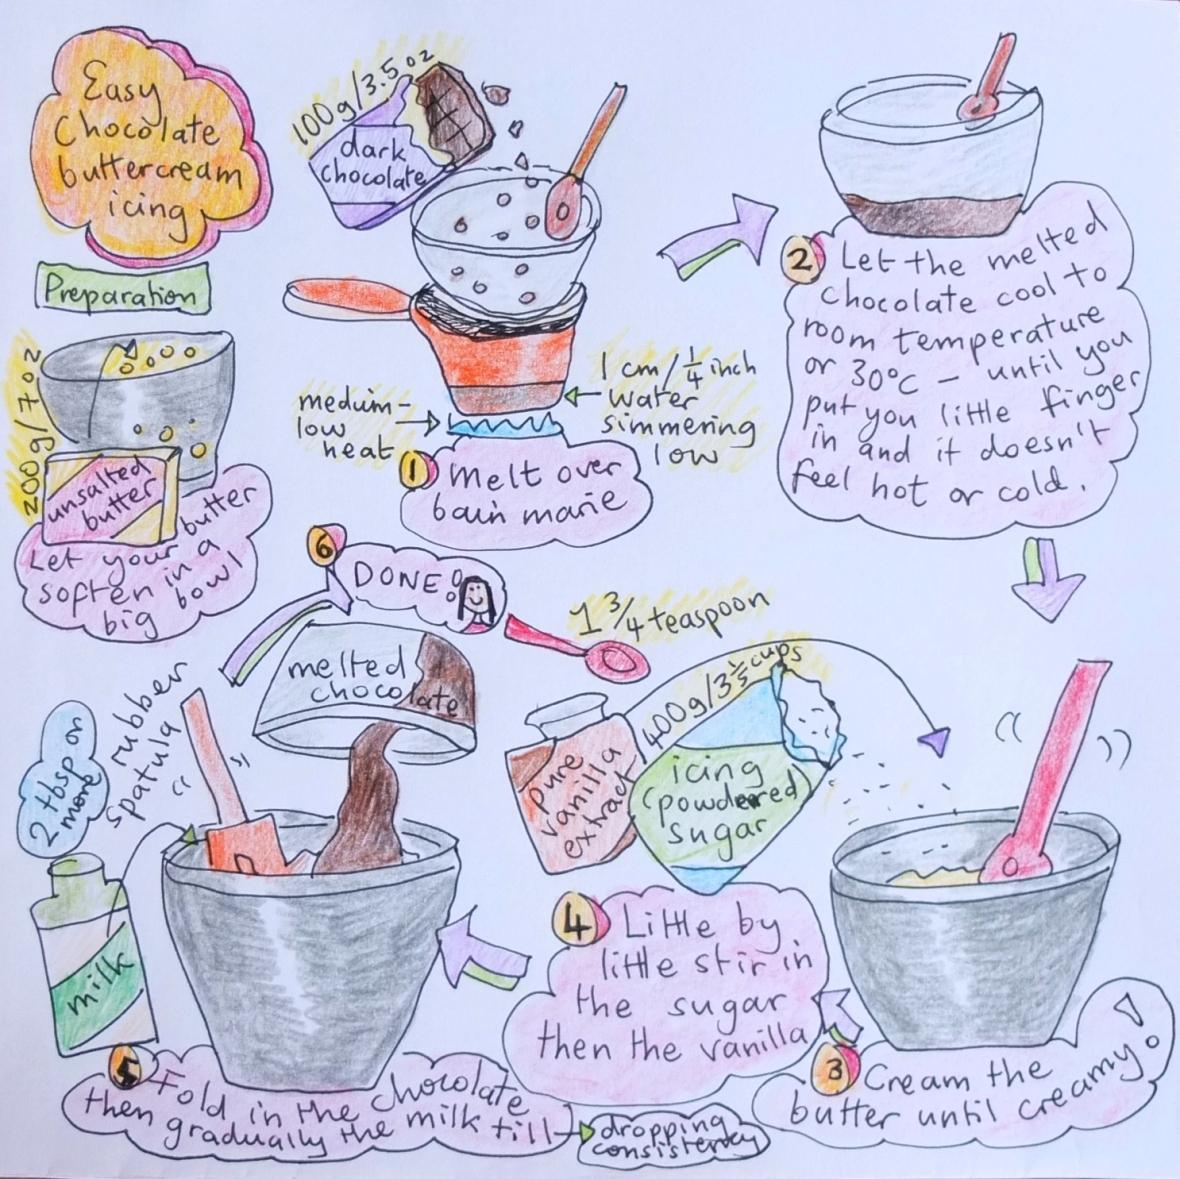 moist Easter chocolate and vanilla sponge cake - chocolate buttercream icing illustrated recipe